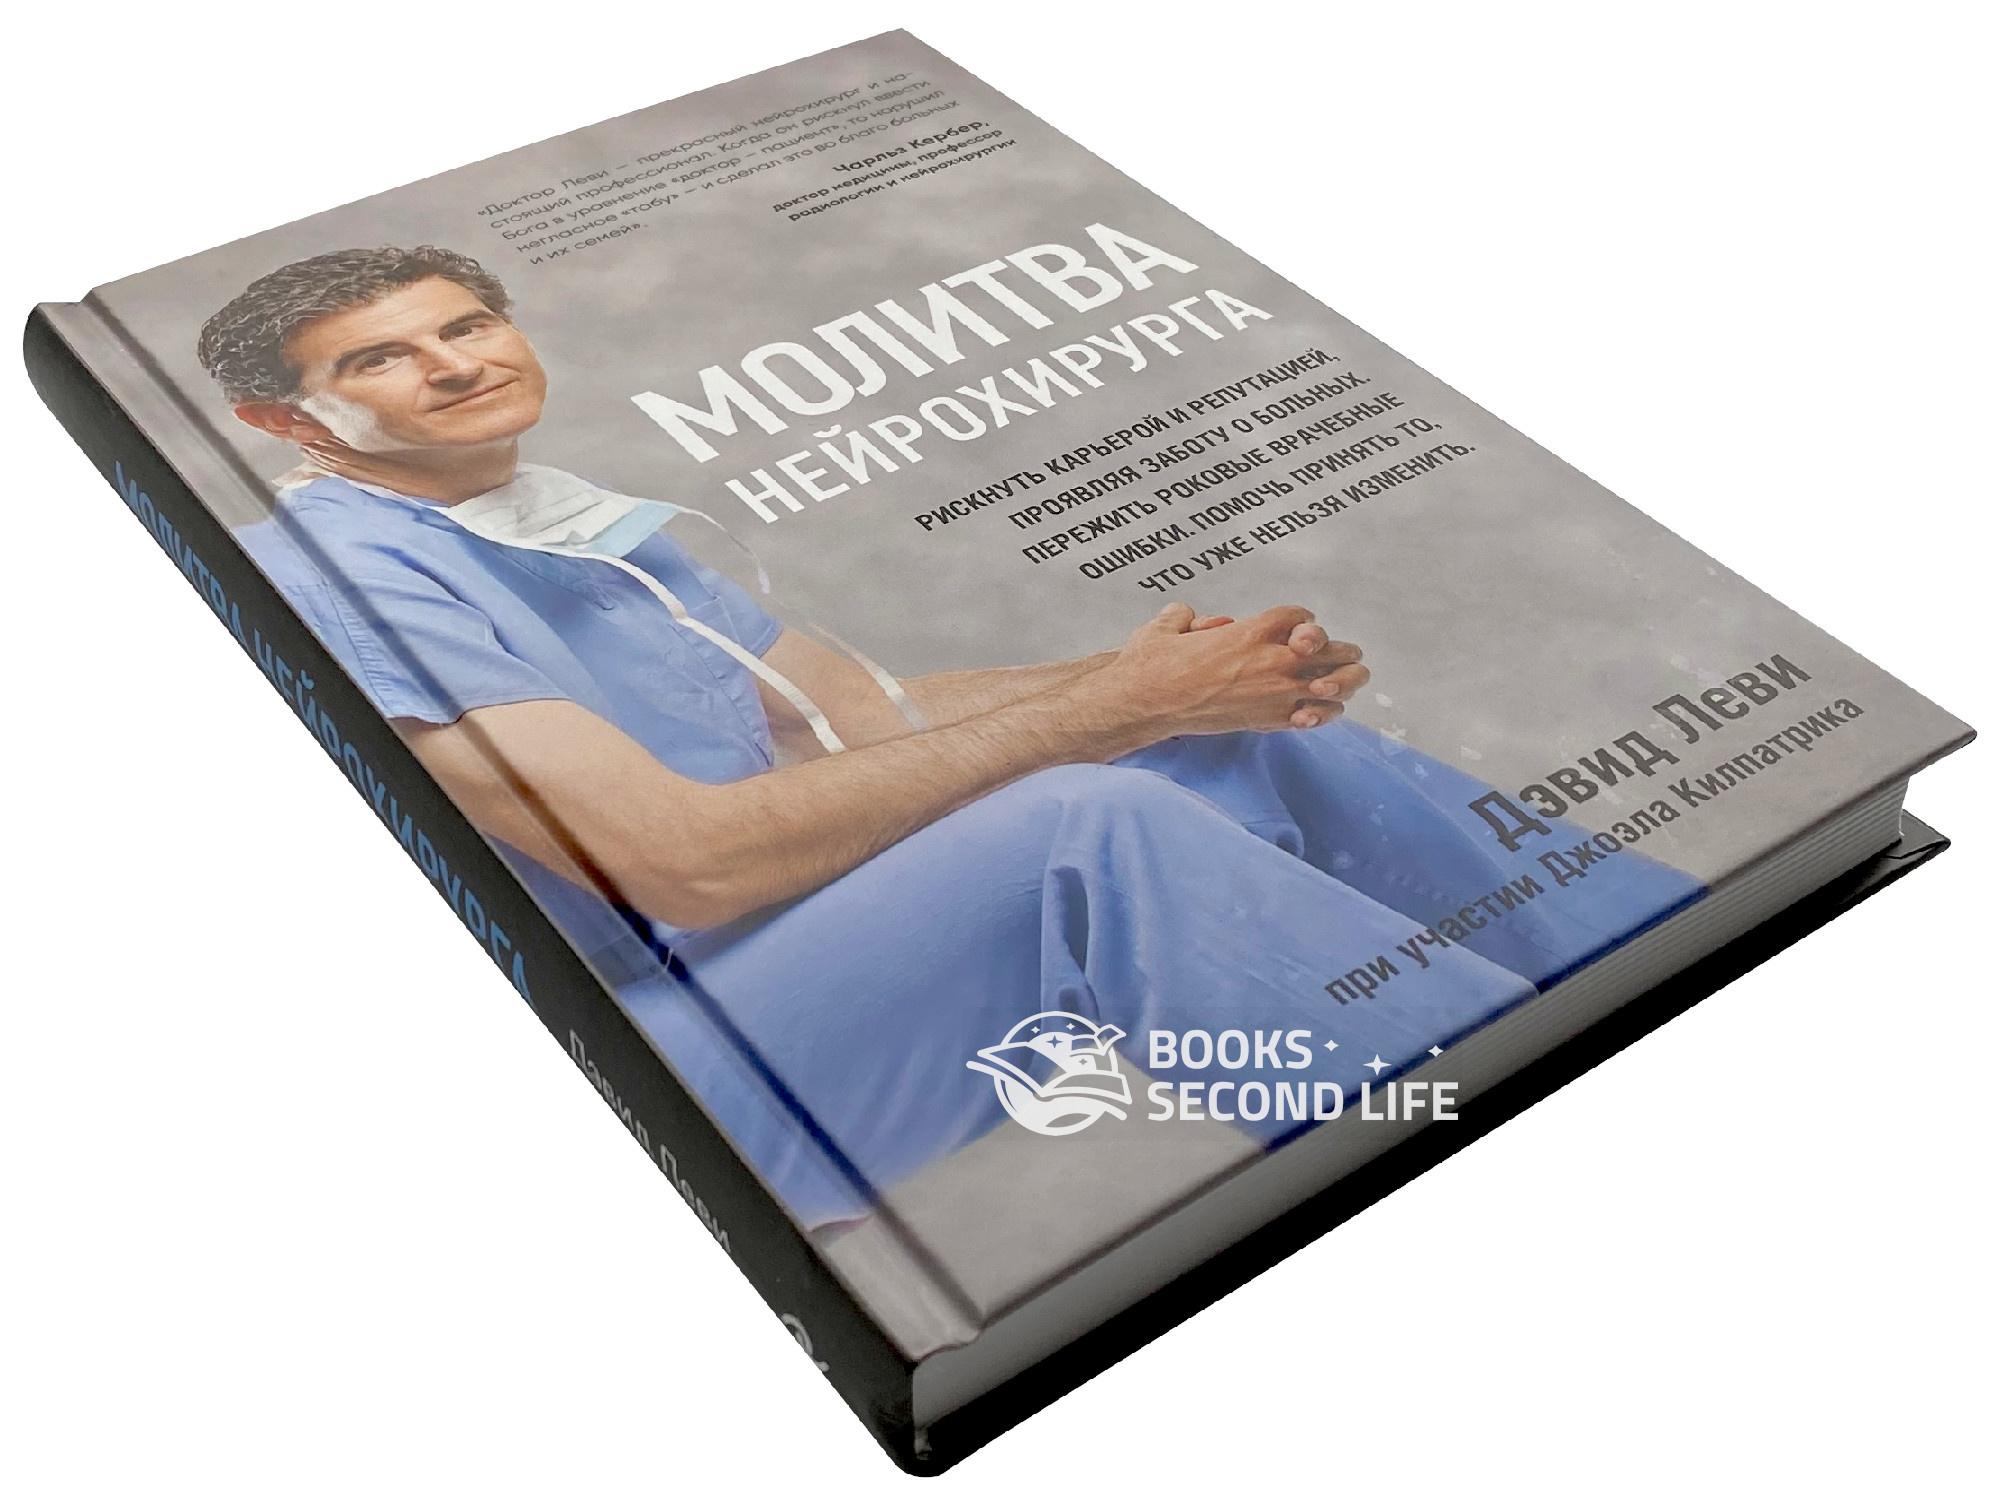 Молитва нейрохирурга. Автор — Дэвид Леви. Переплет —